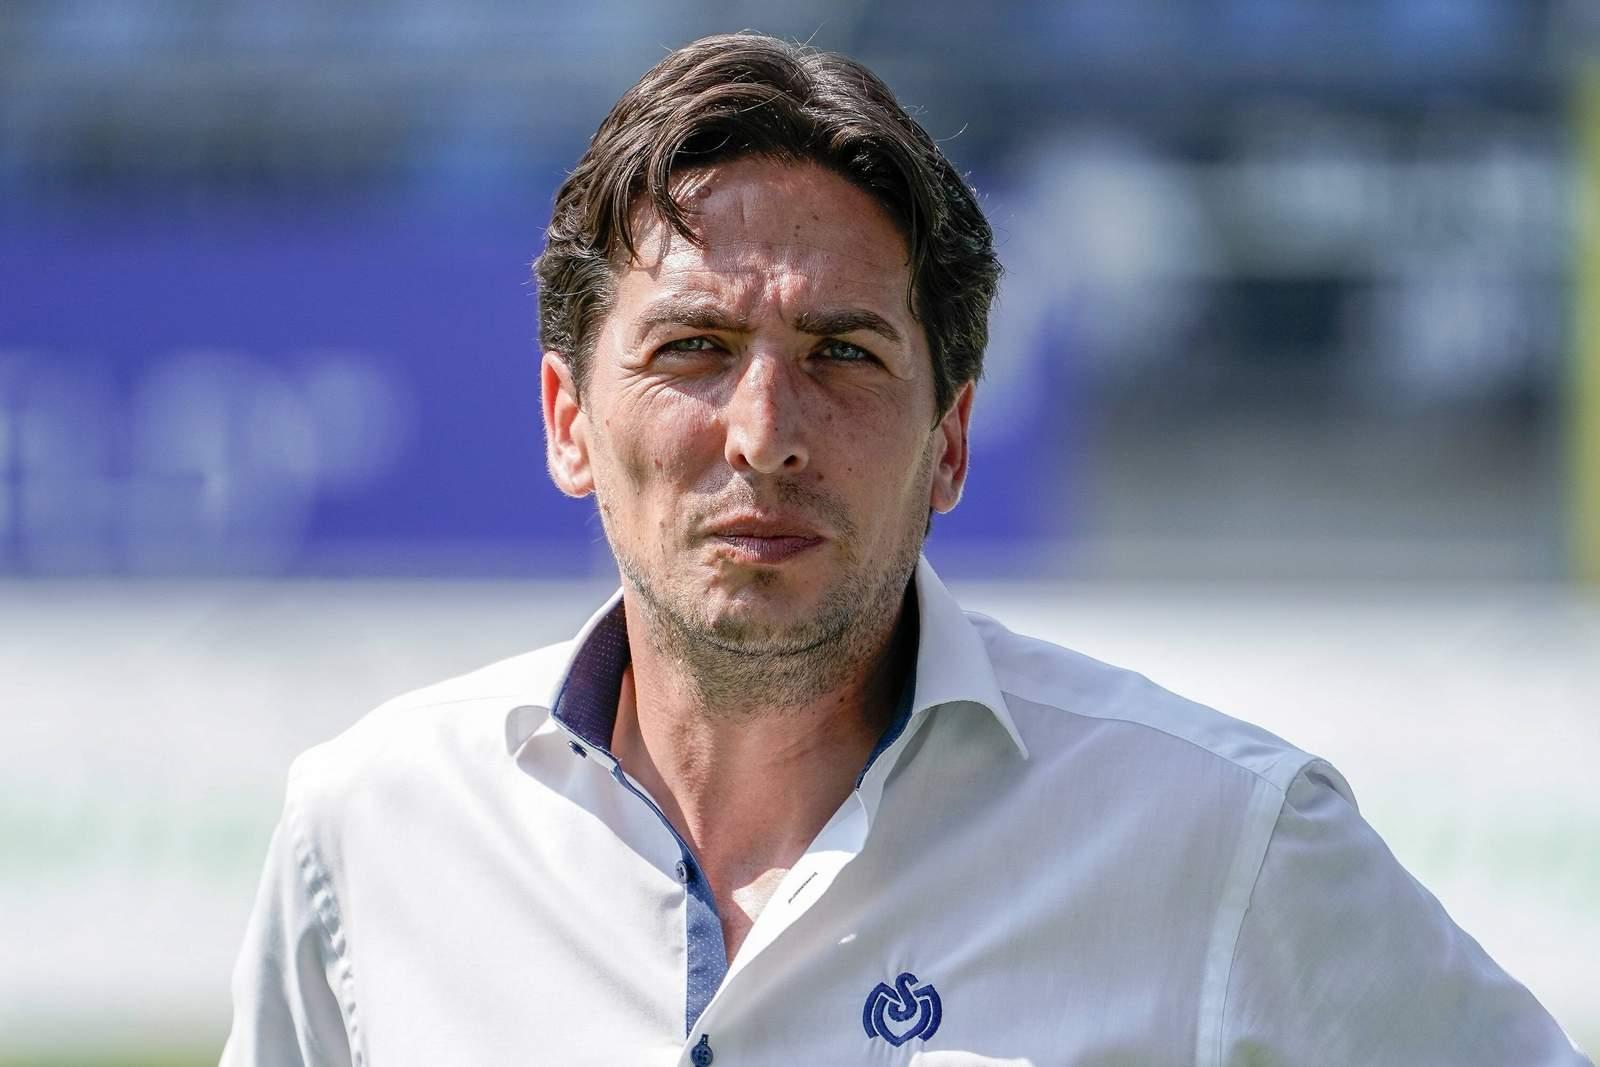 Ivica Grlic vom MSV Duisburg